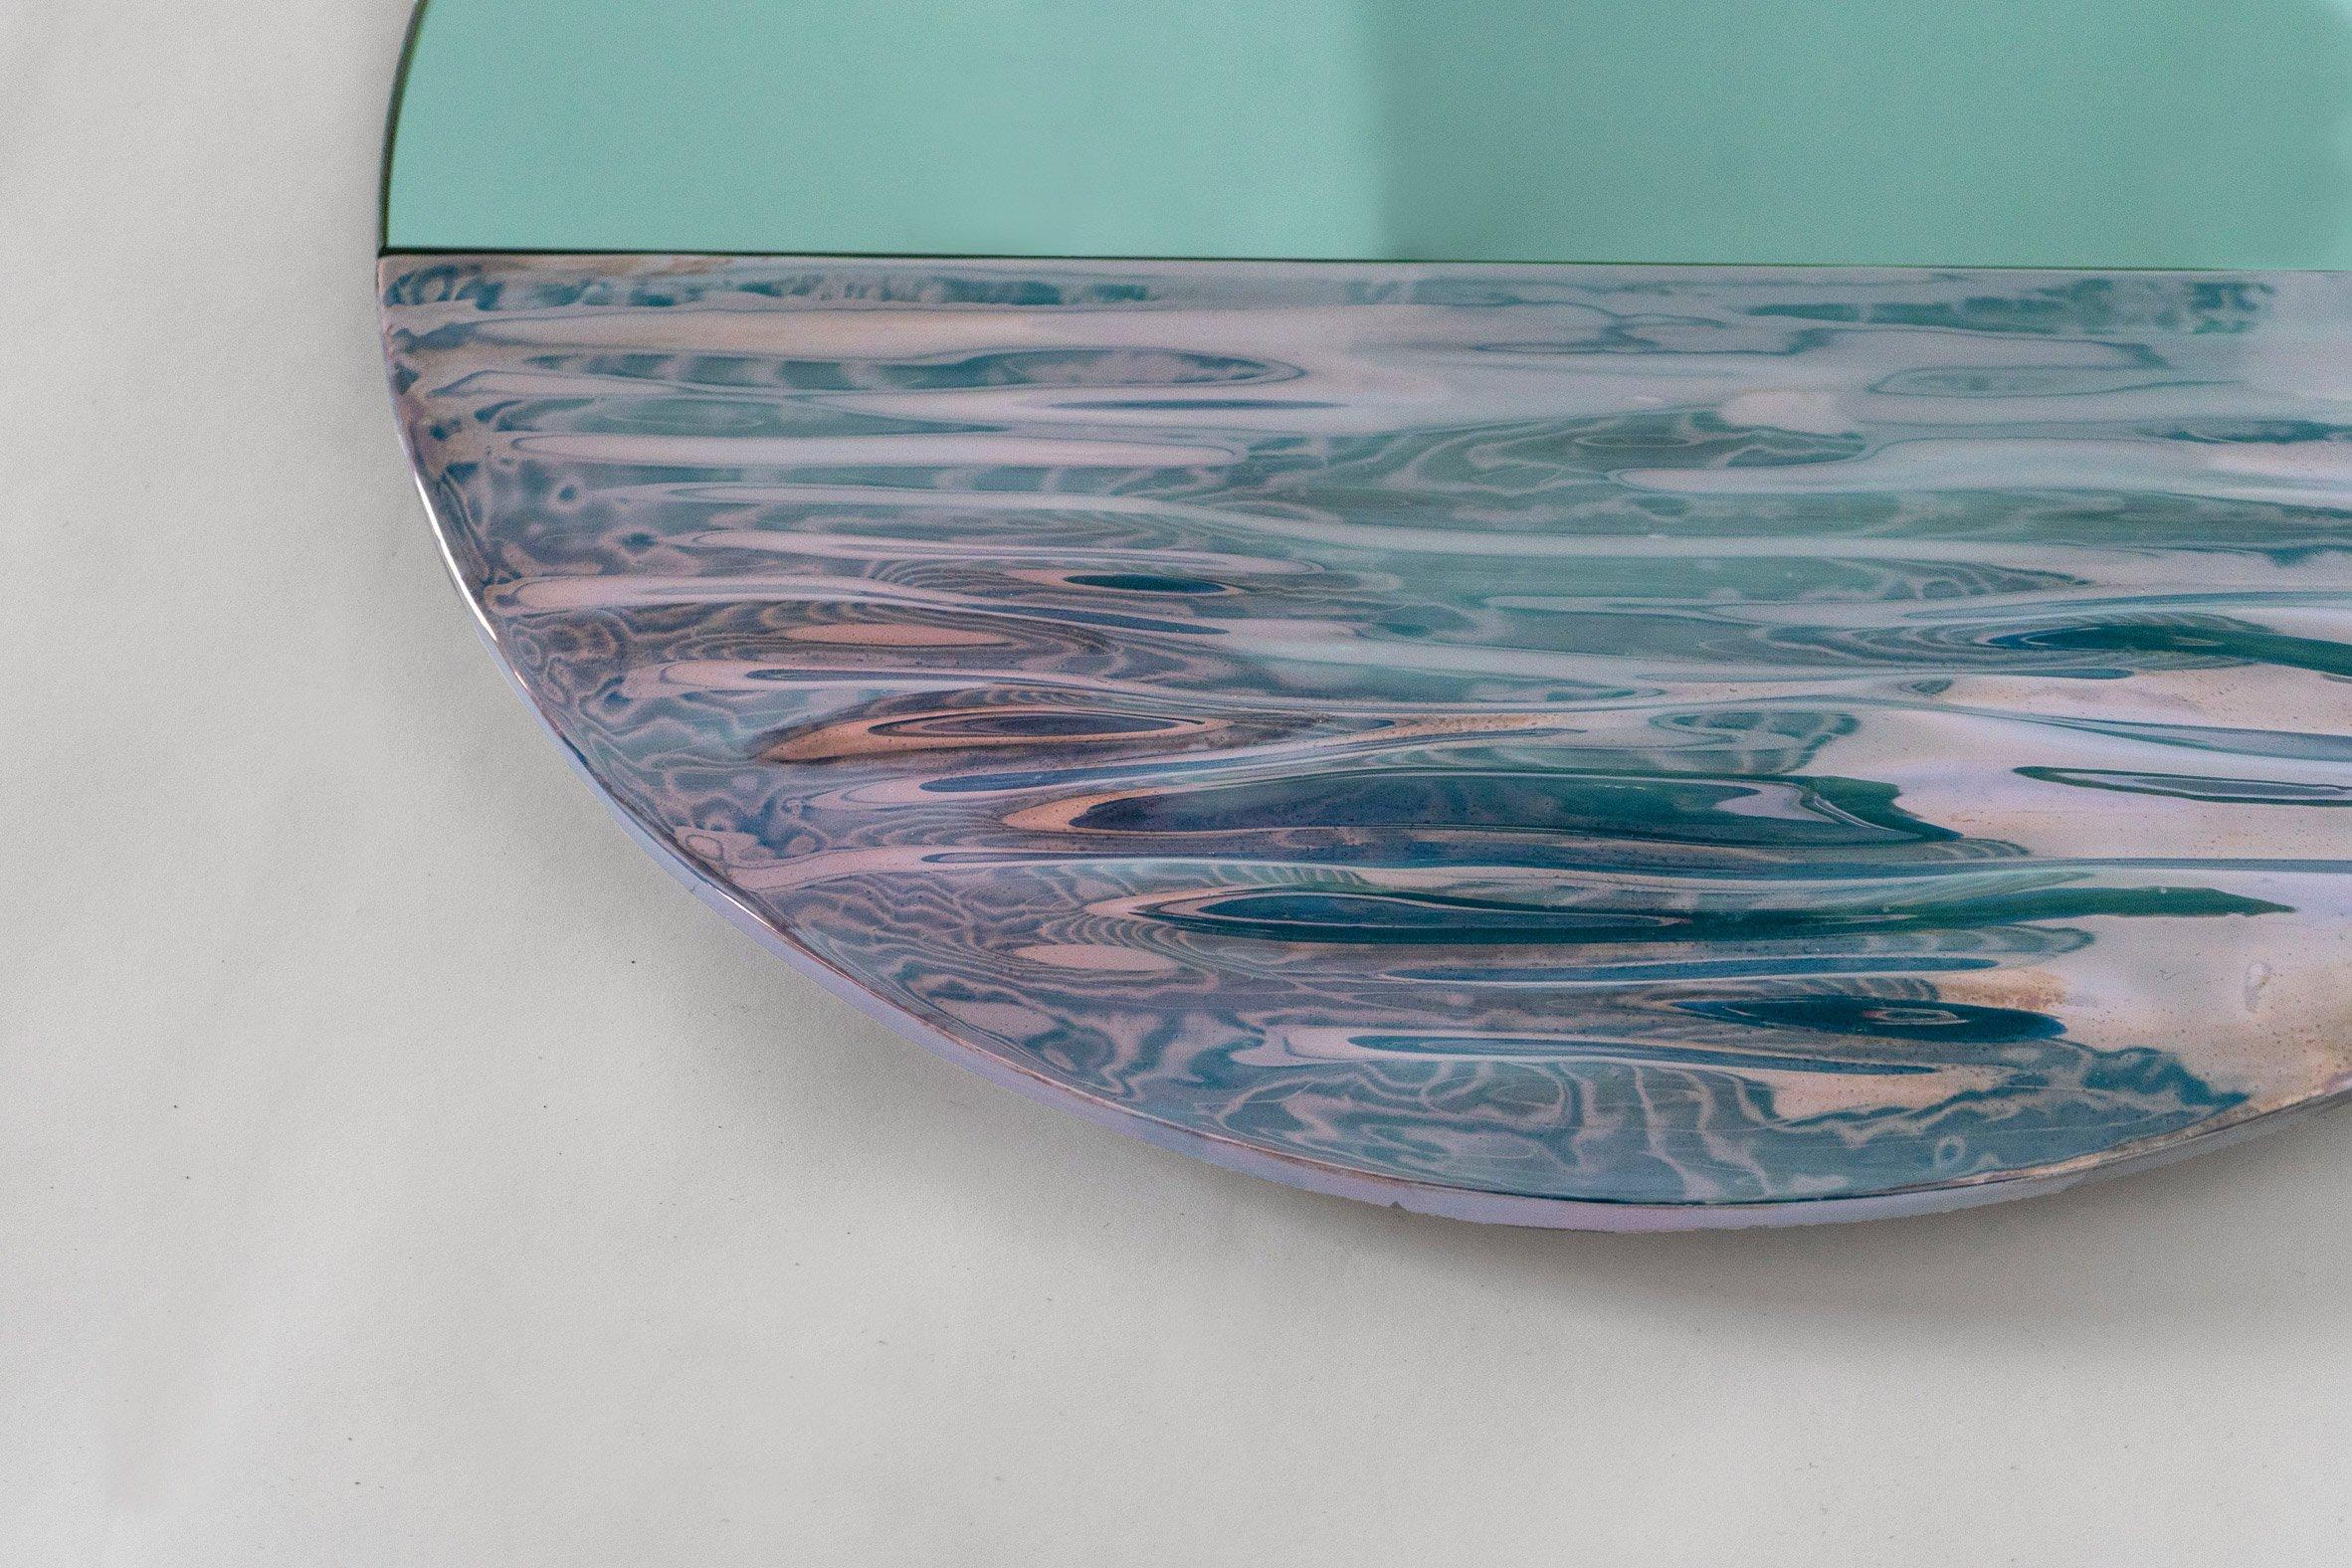 Close-up of Orizon mirror by Ocrum Studio in vivid blue